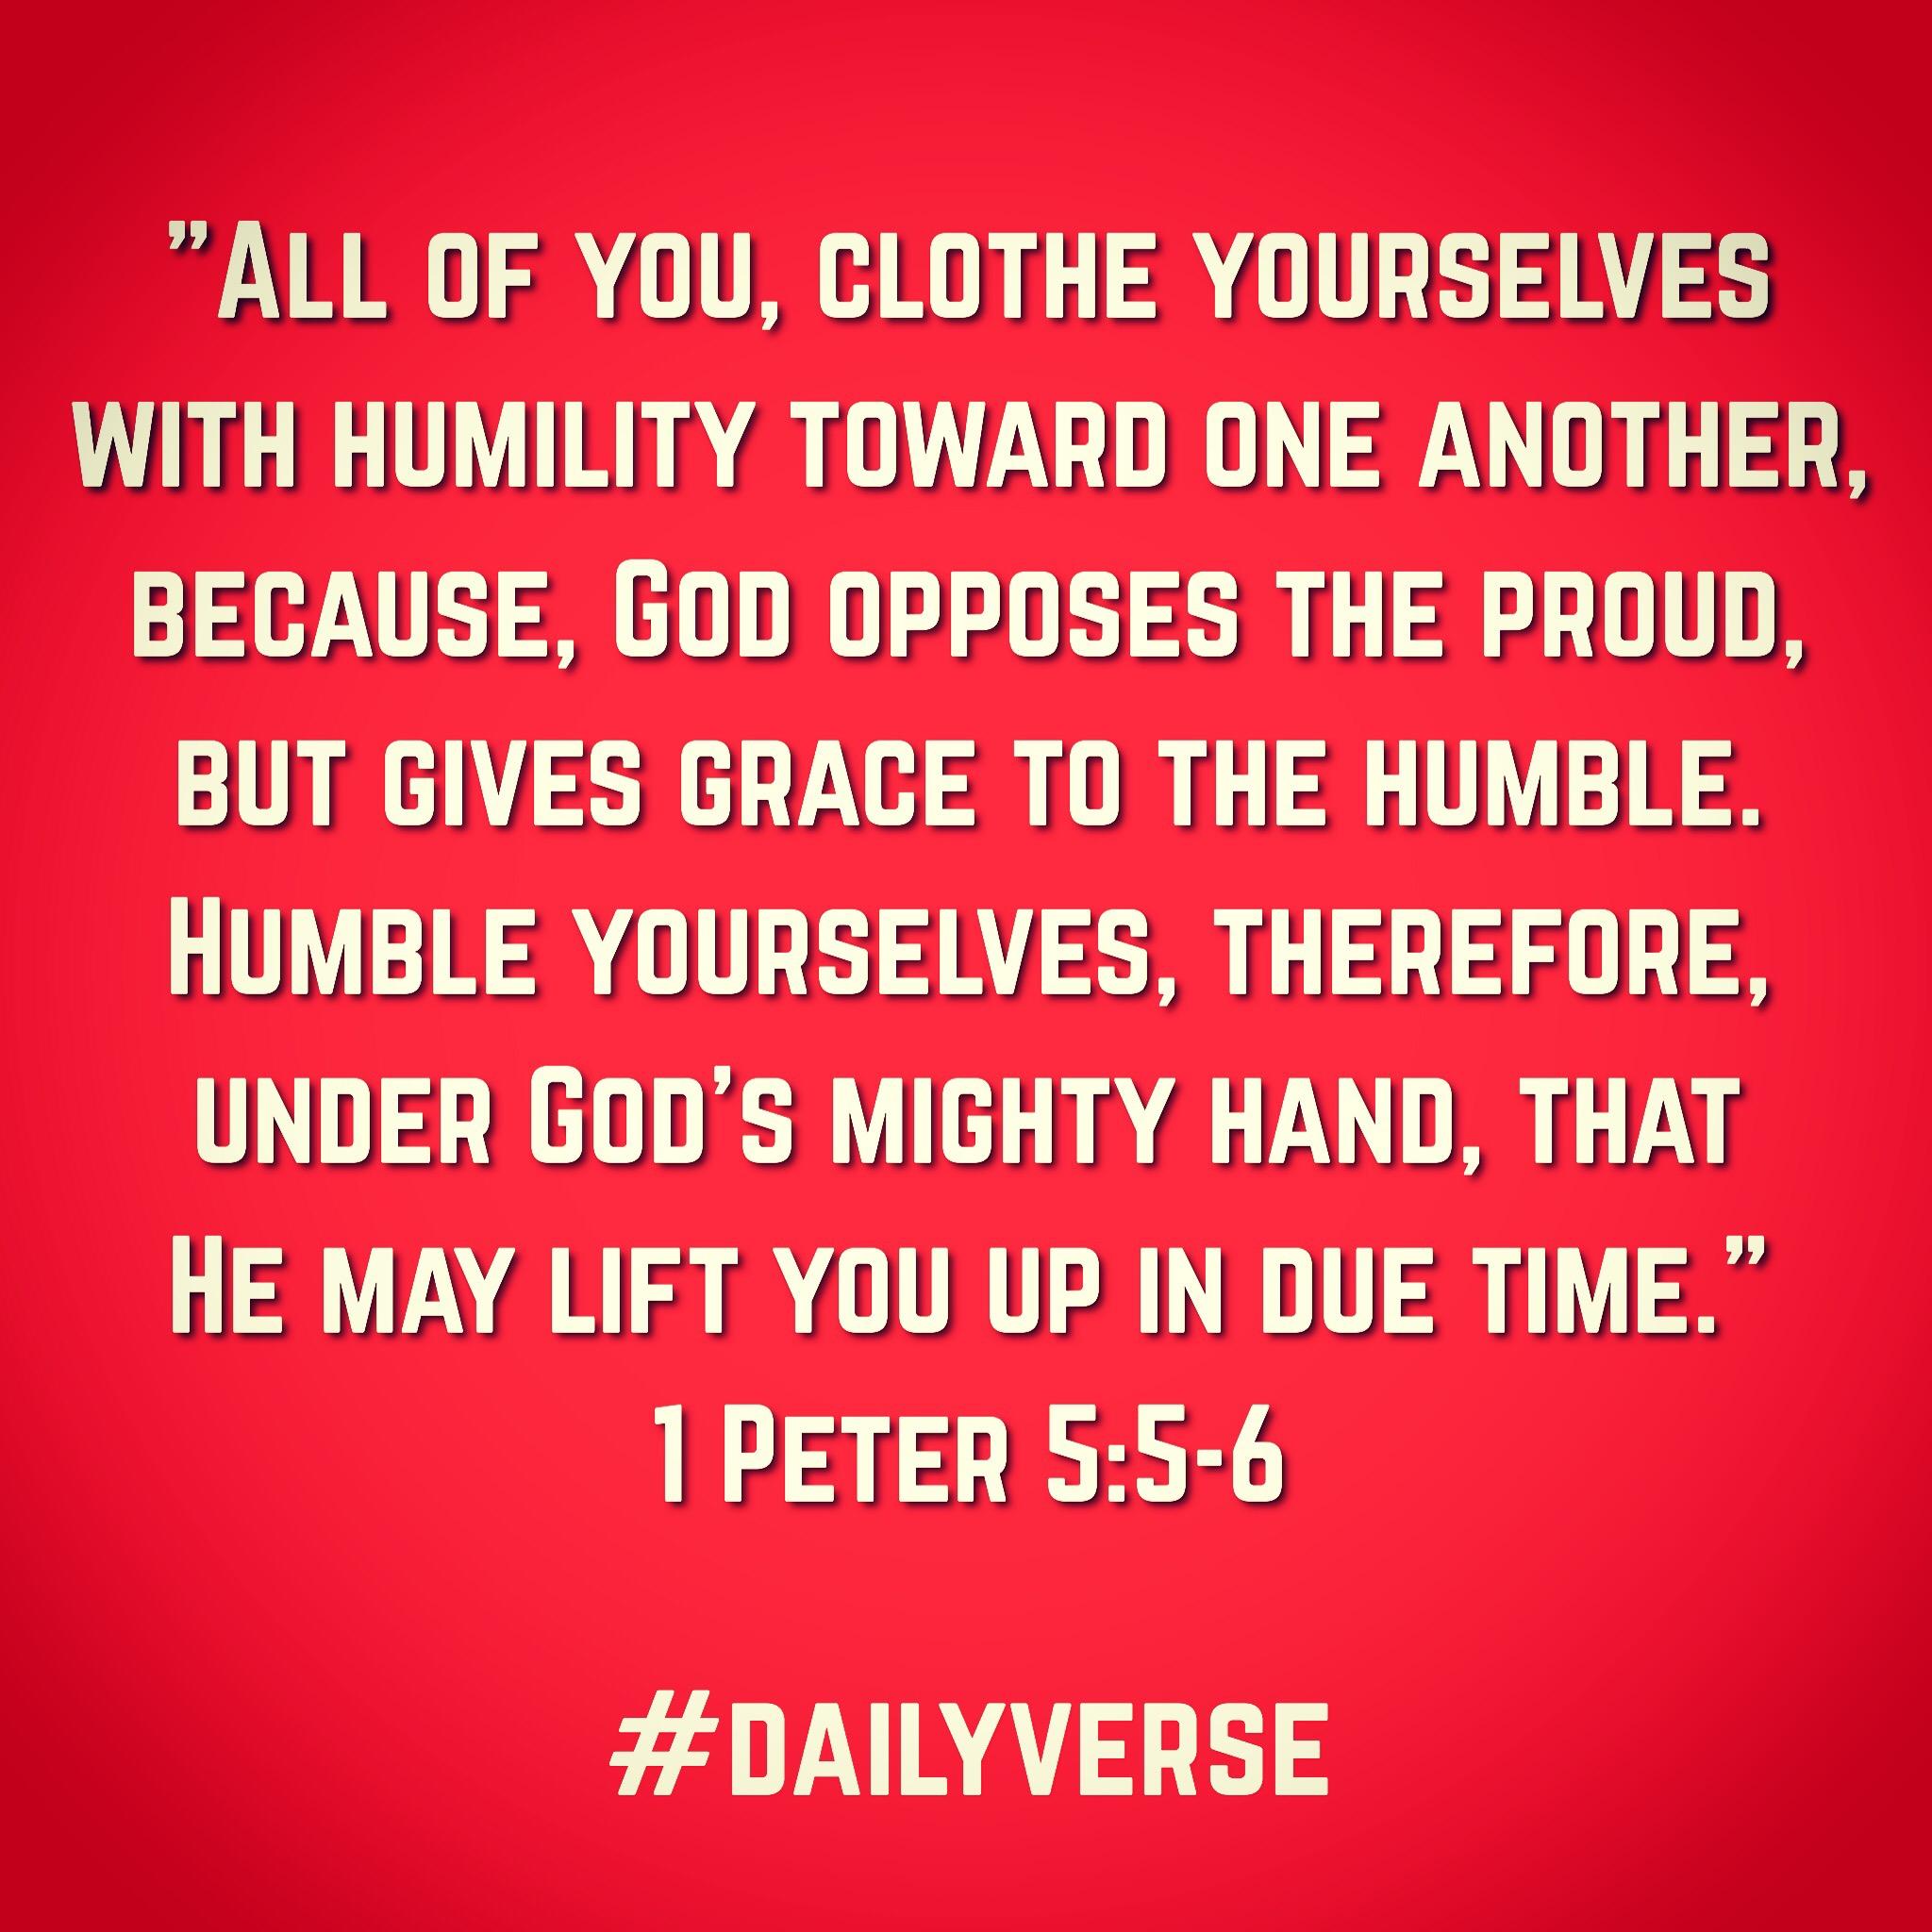 1 Peter 5:5-6